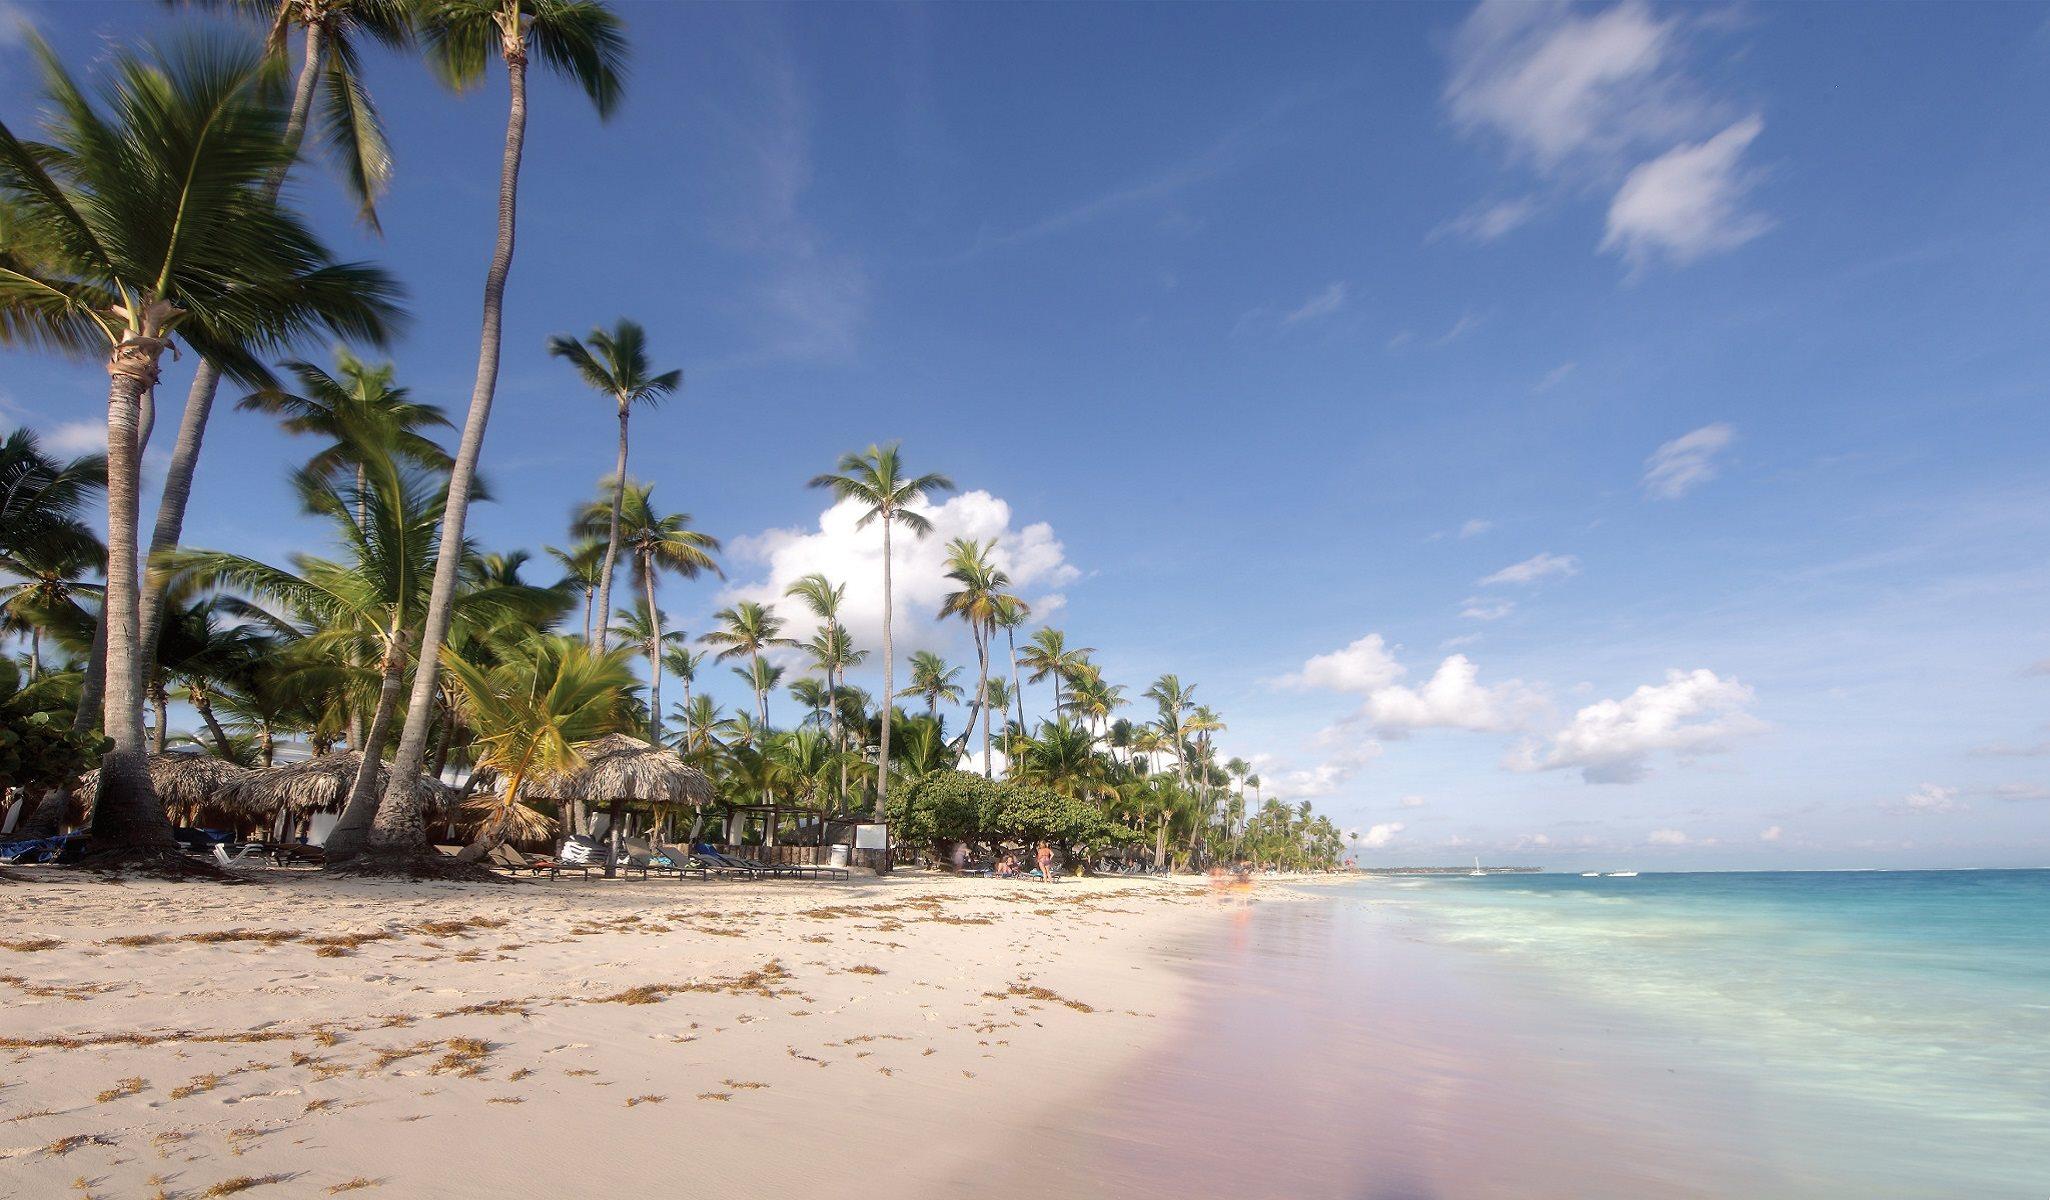 Flights to Punta Cana   Air Transat